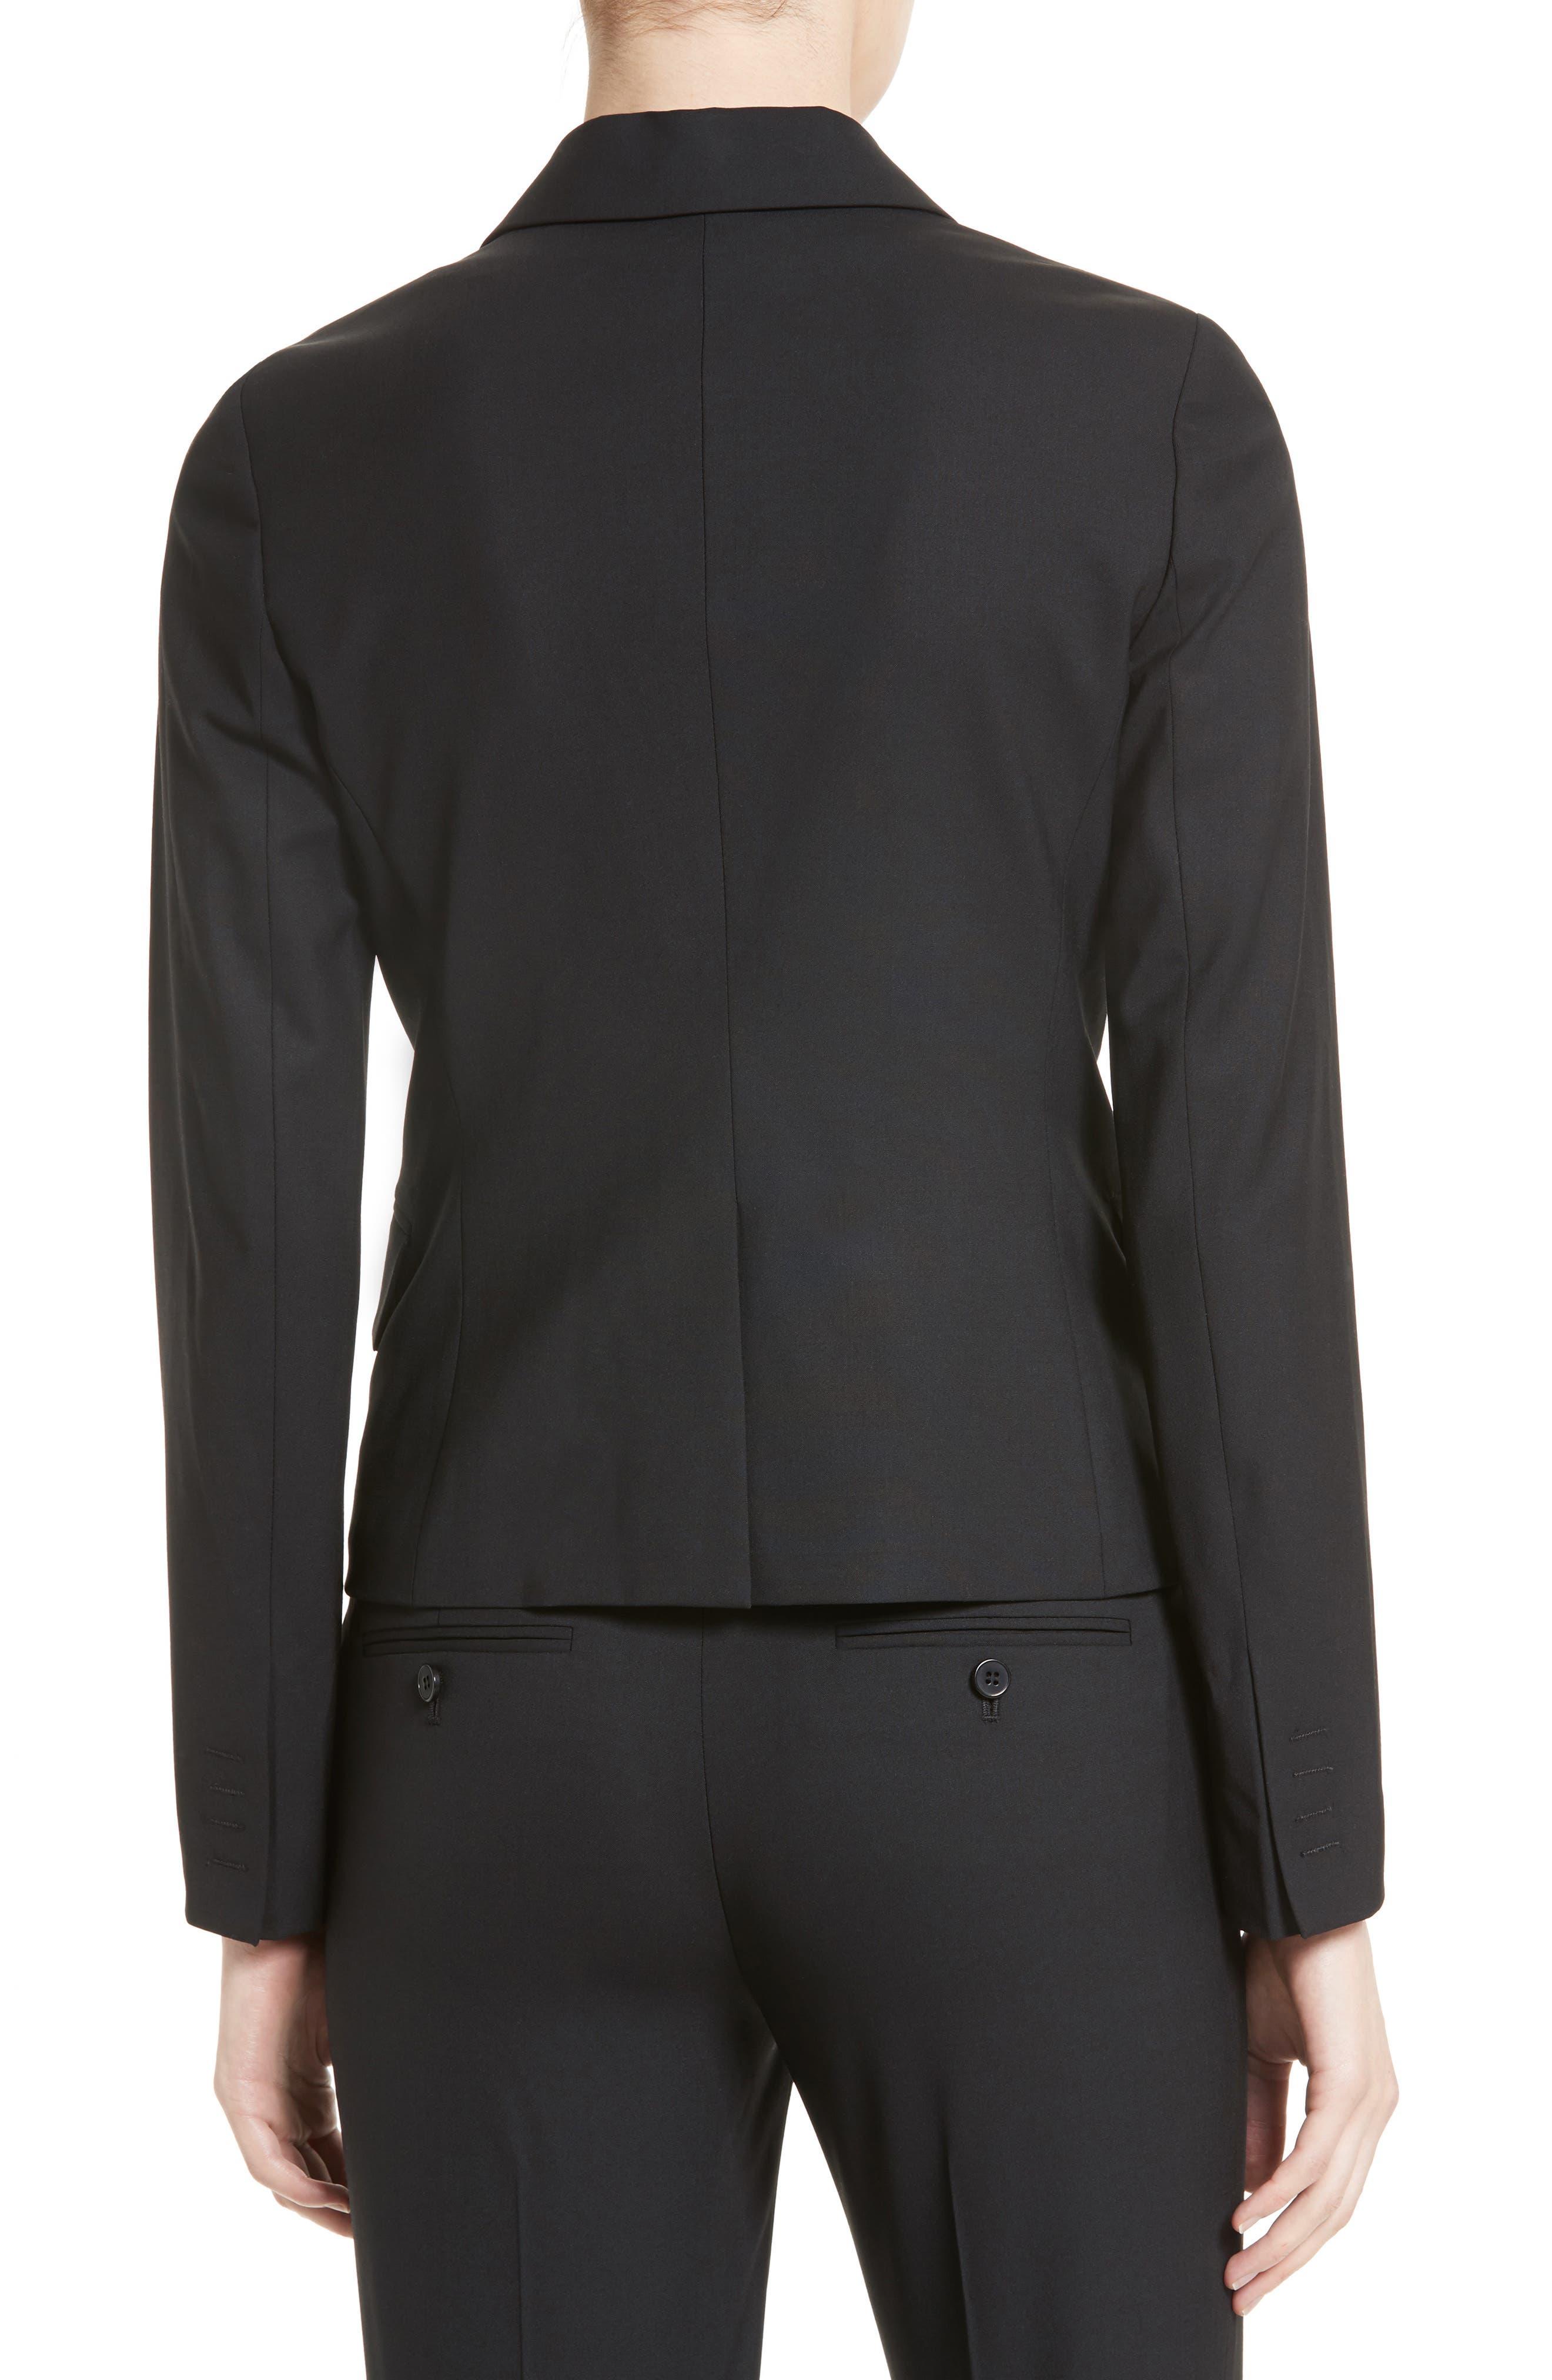 Brince B Good Wool Suit Jacket,                             Alternate thumbnail 2, color,                             BLACK